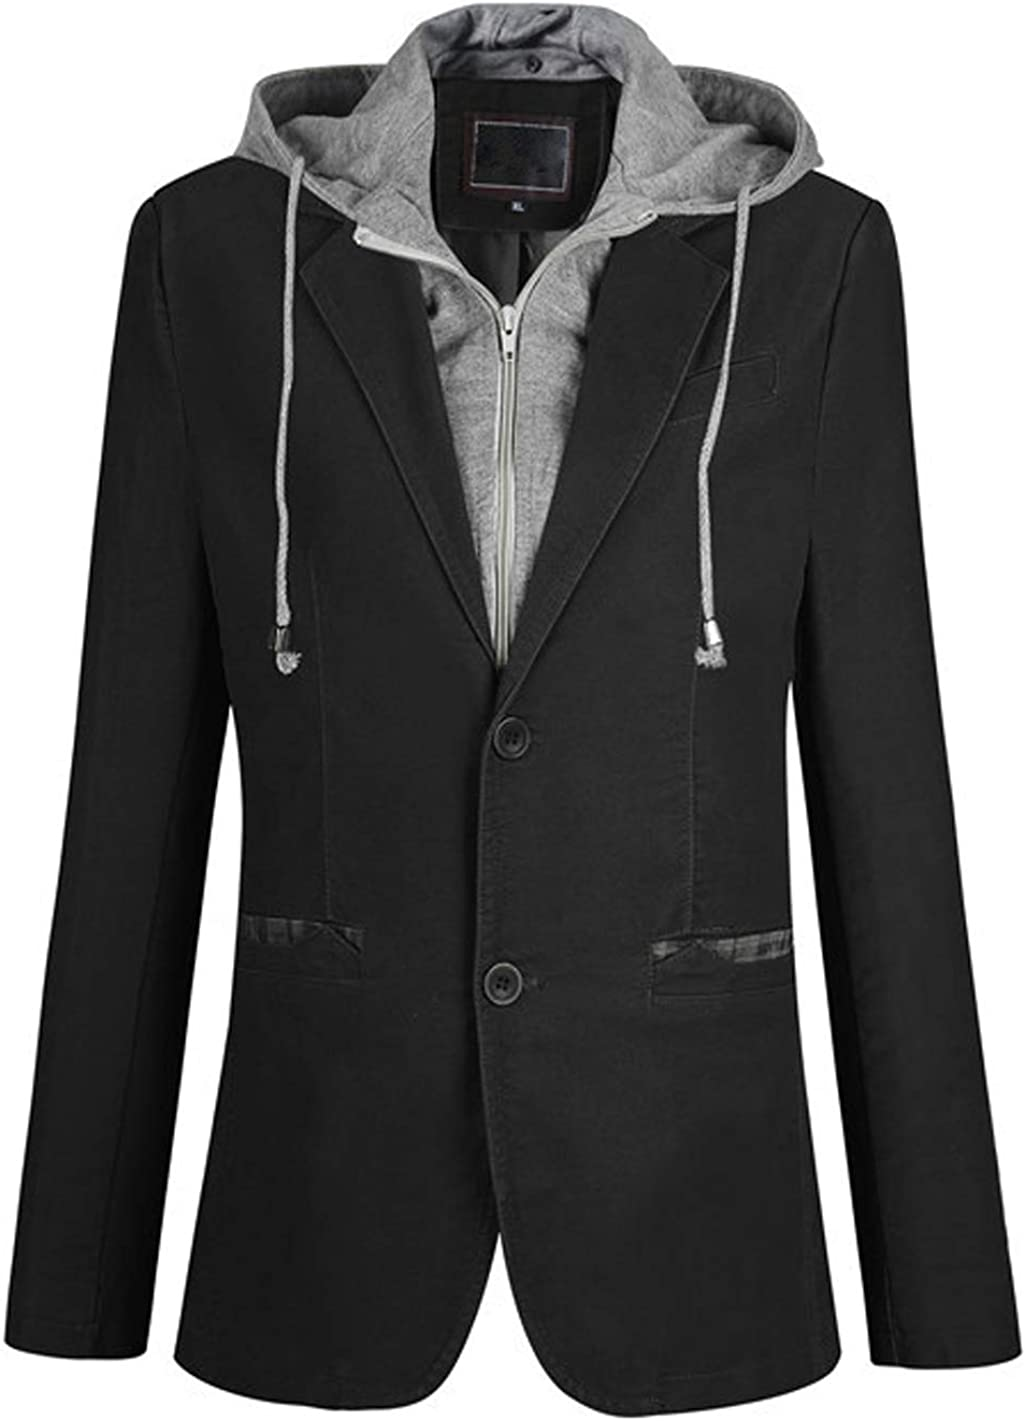 chouyatou Men's Slimming Notch Lapel 2 Button Removable Hooded Cotton Suit Blazer Jacket